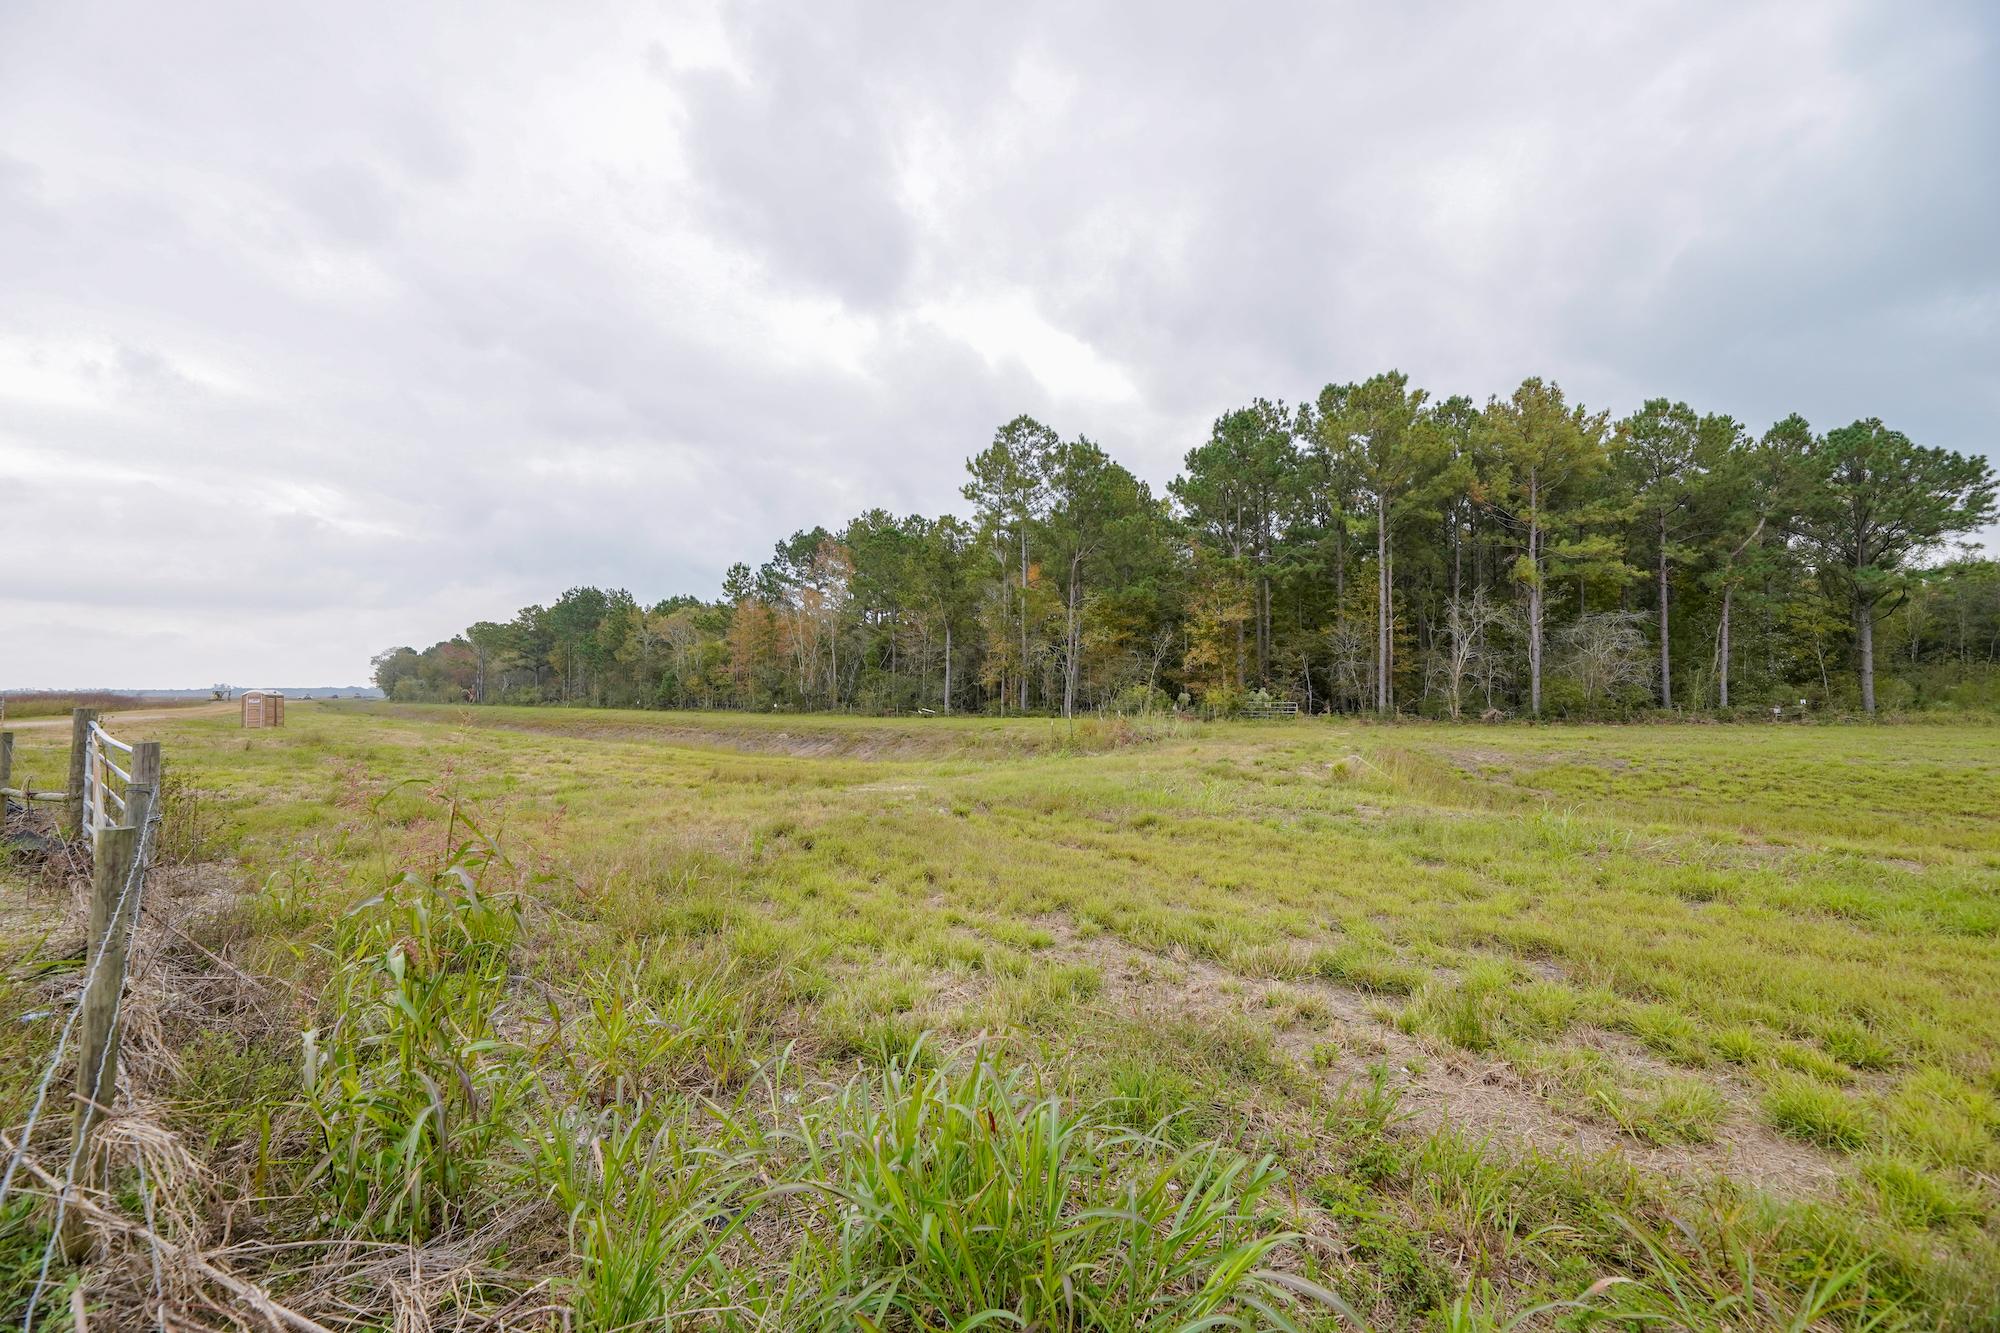 Jefferson County Development Land - Image 12 of 36